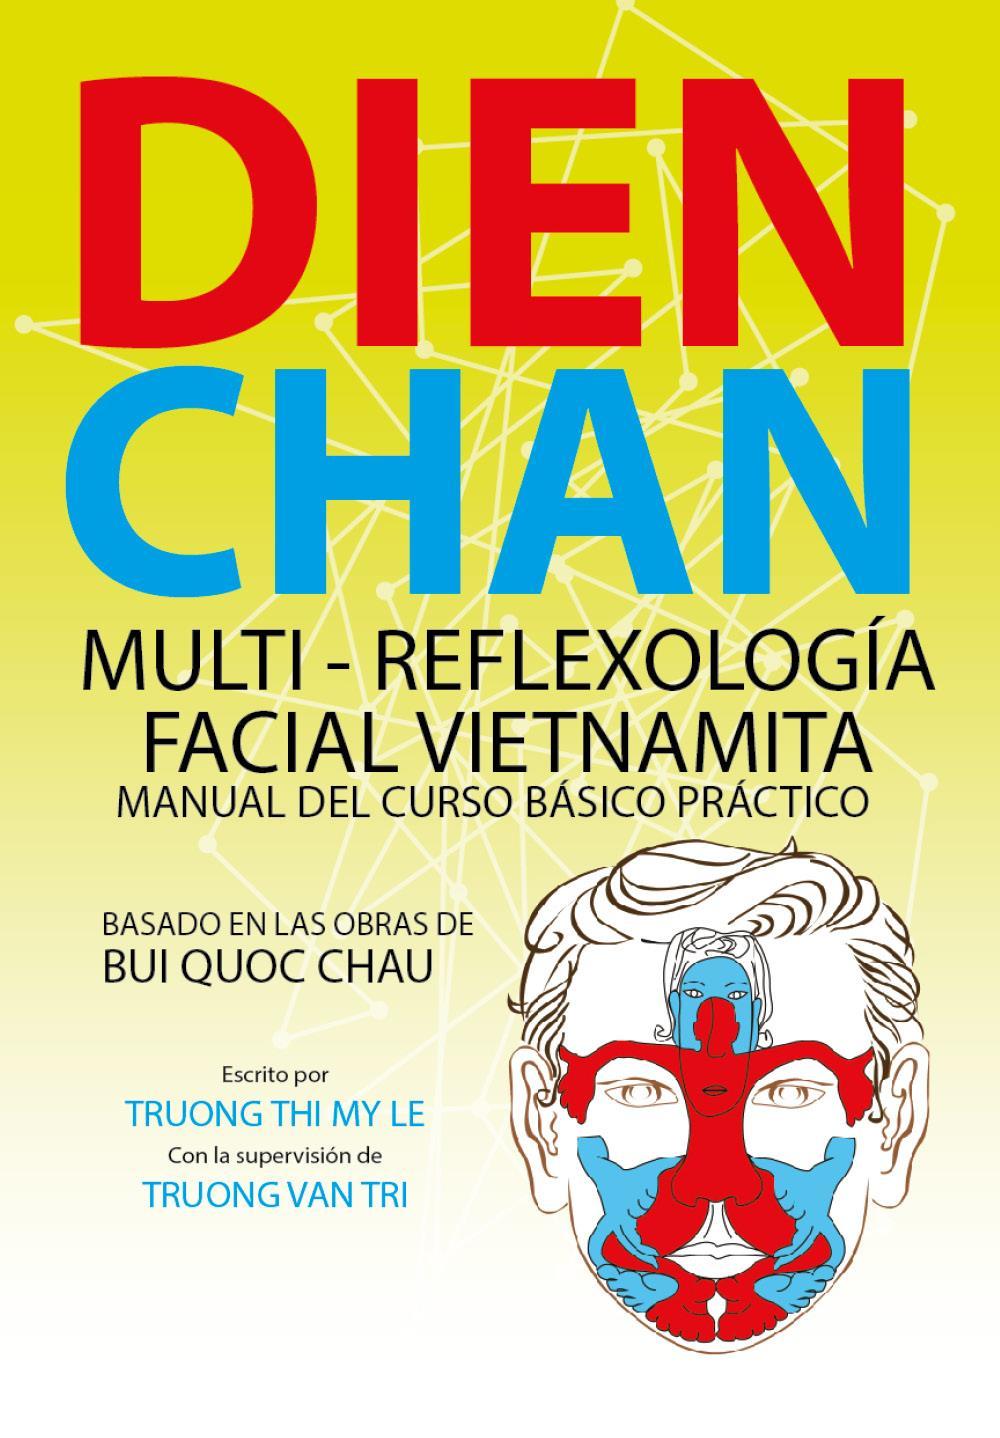 Dien Chan multi - reflexologìa facial vietnamita